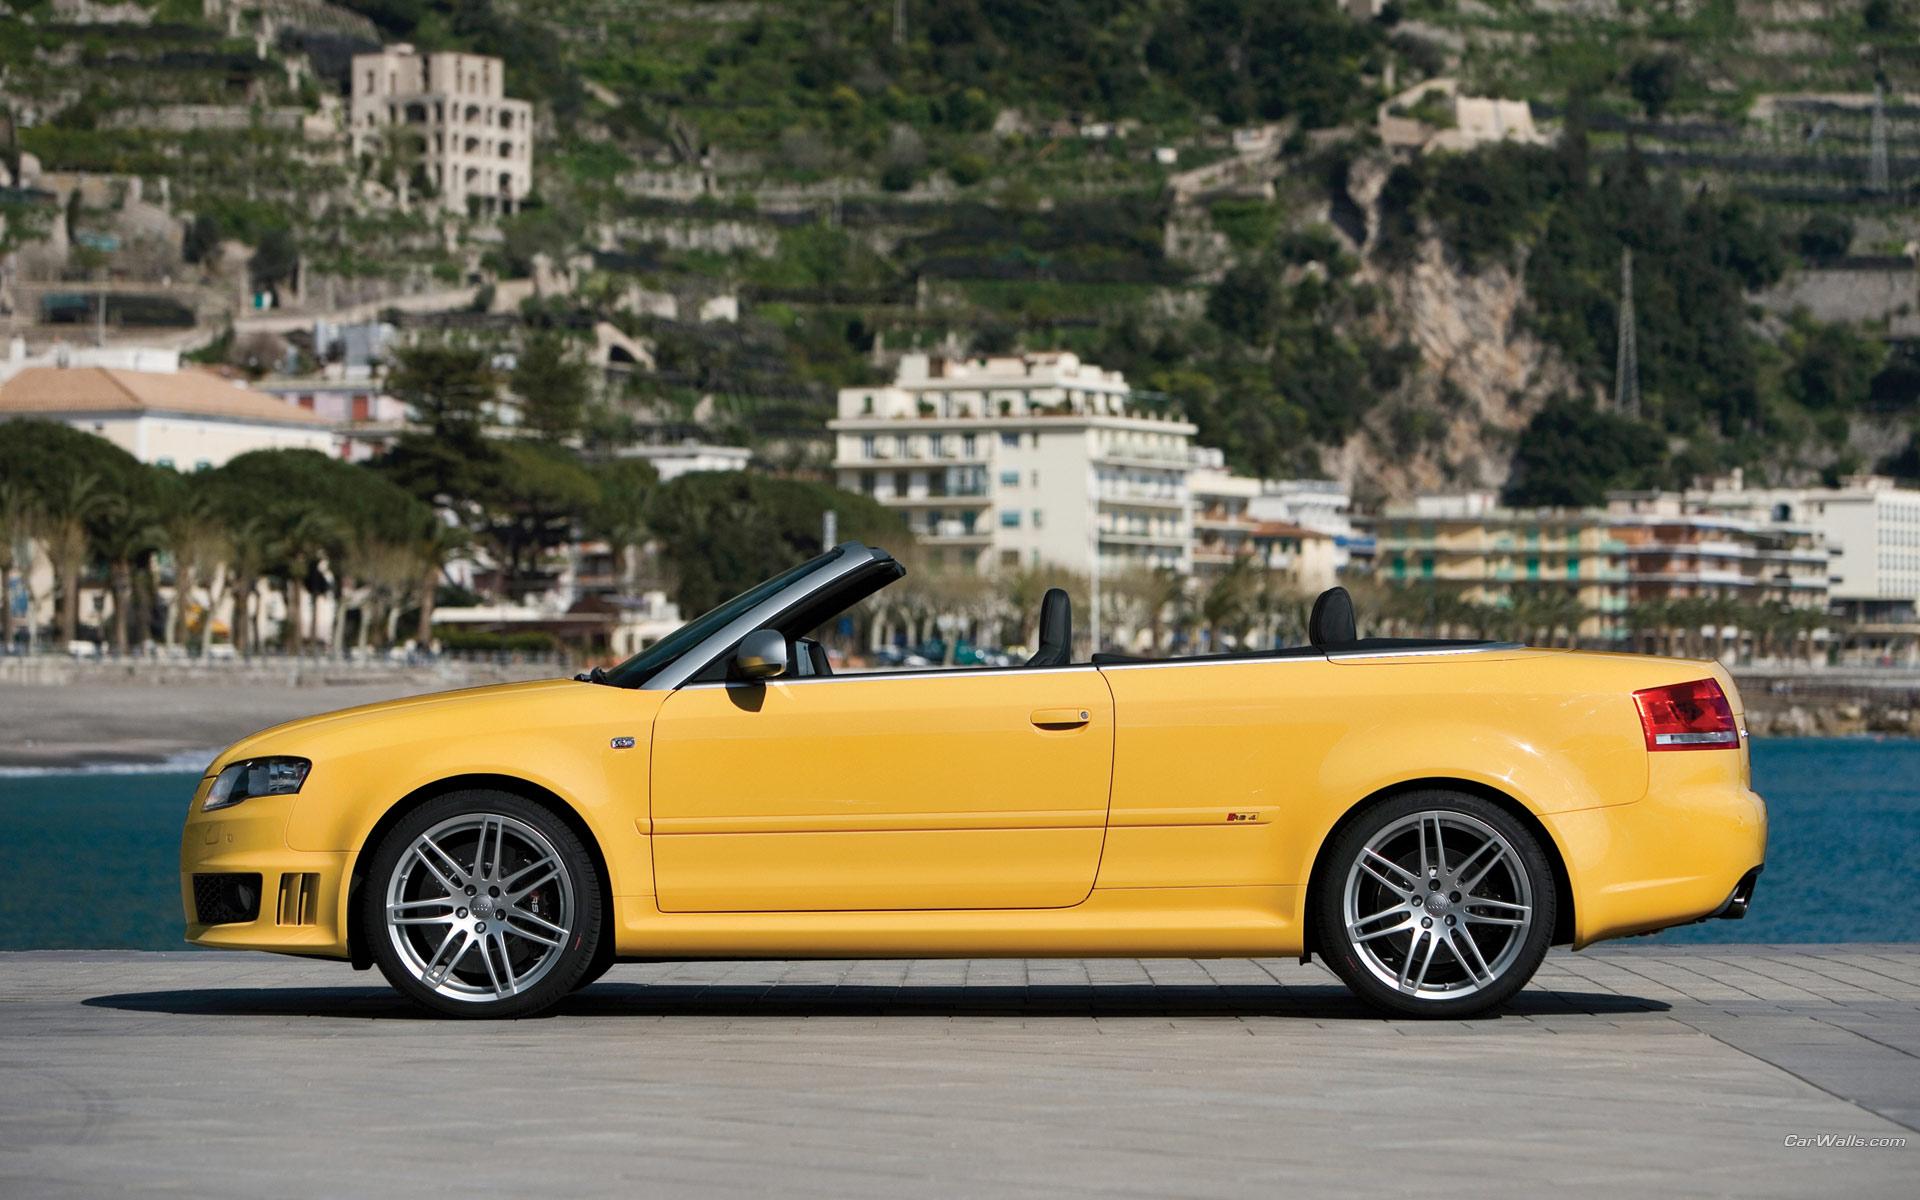 Download full size Audi wallpaper / Cars / 1920x1200